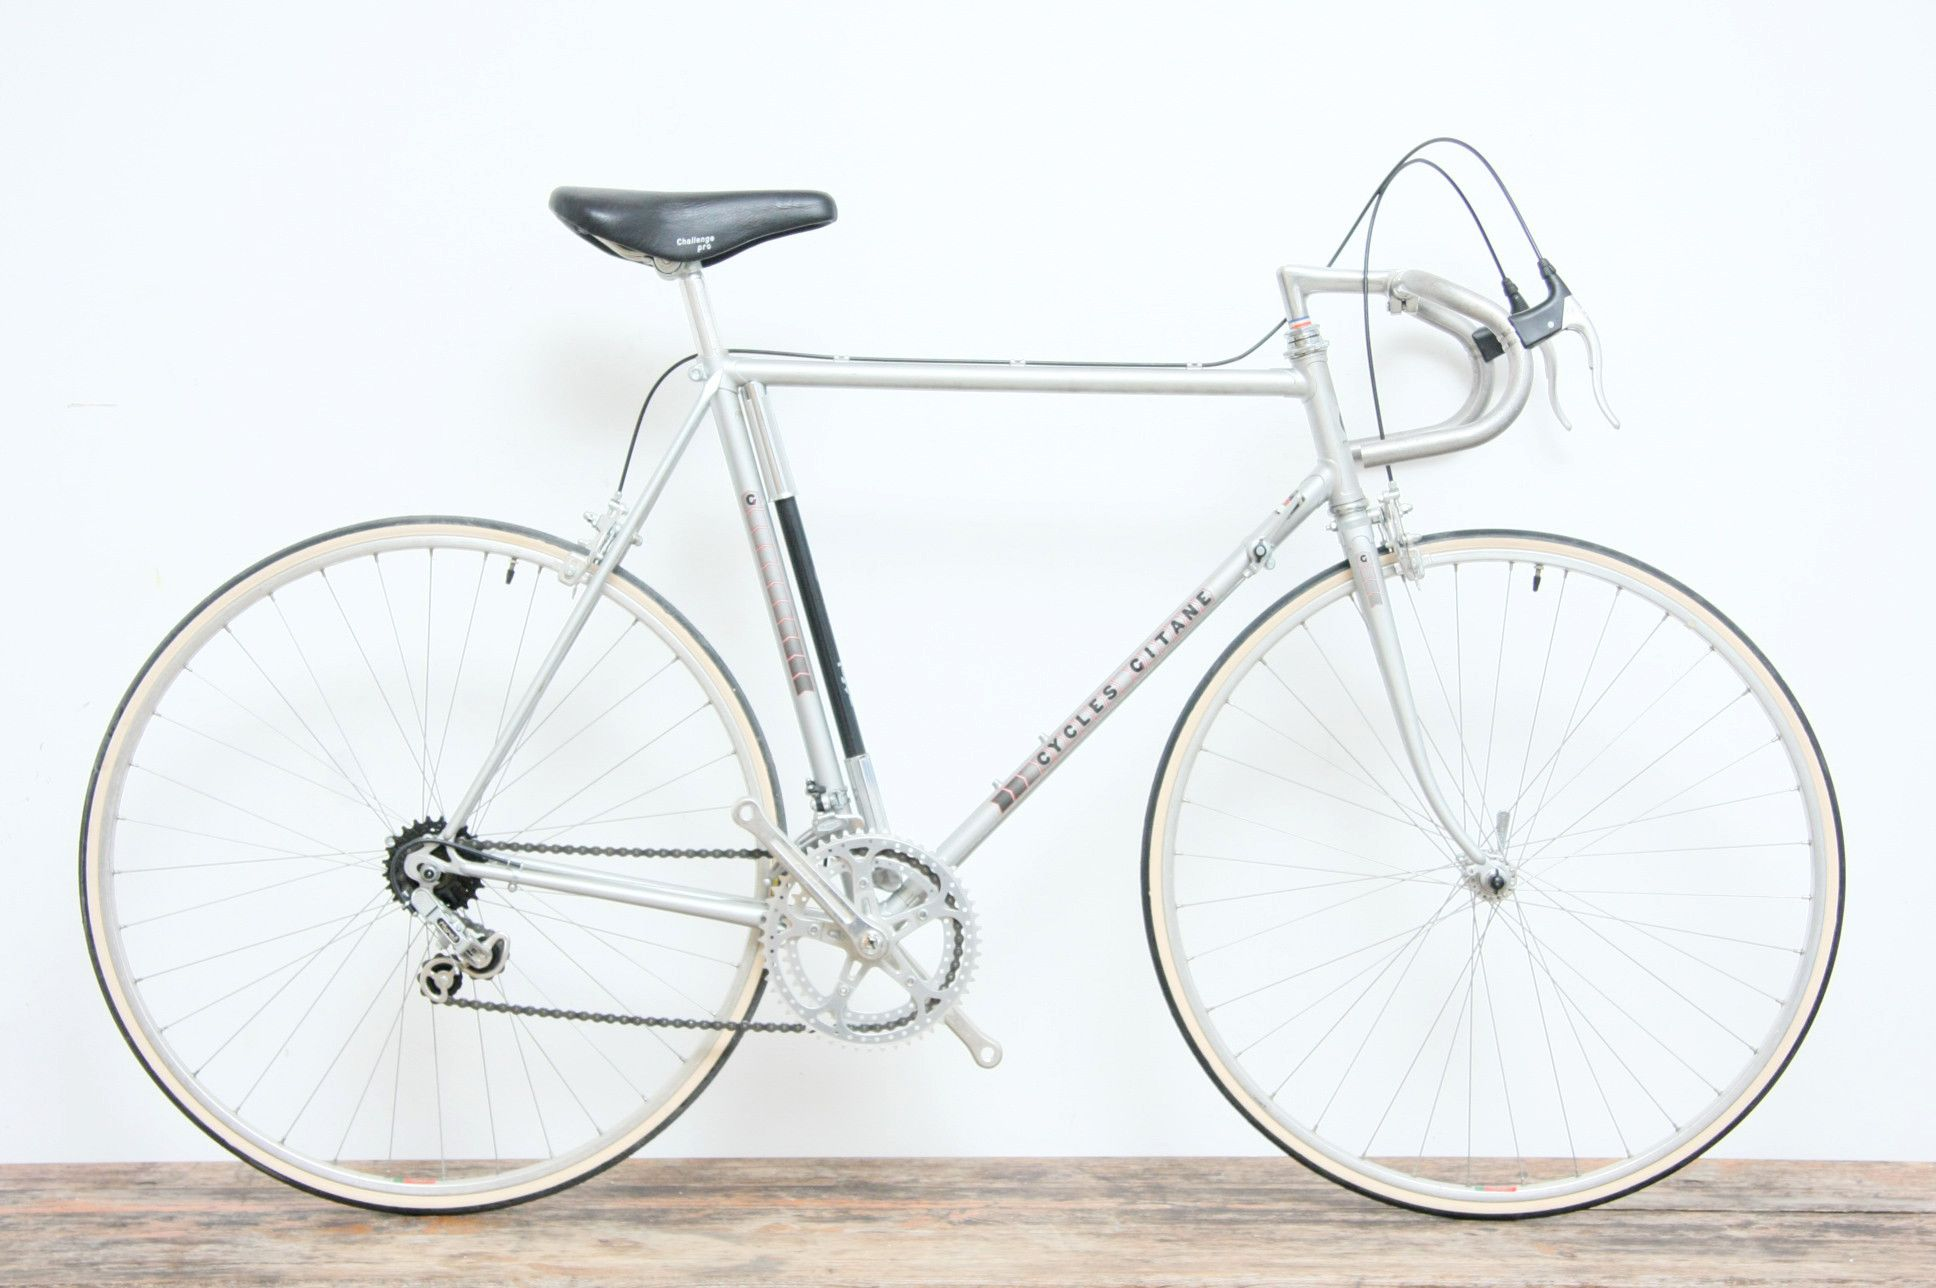 Pedal Pedlar - 56cm New Old Stock Gitane Vintage Racing Bike